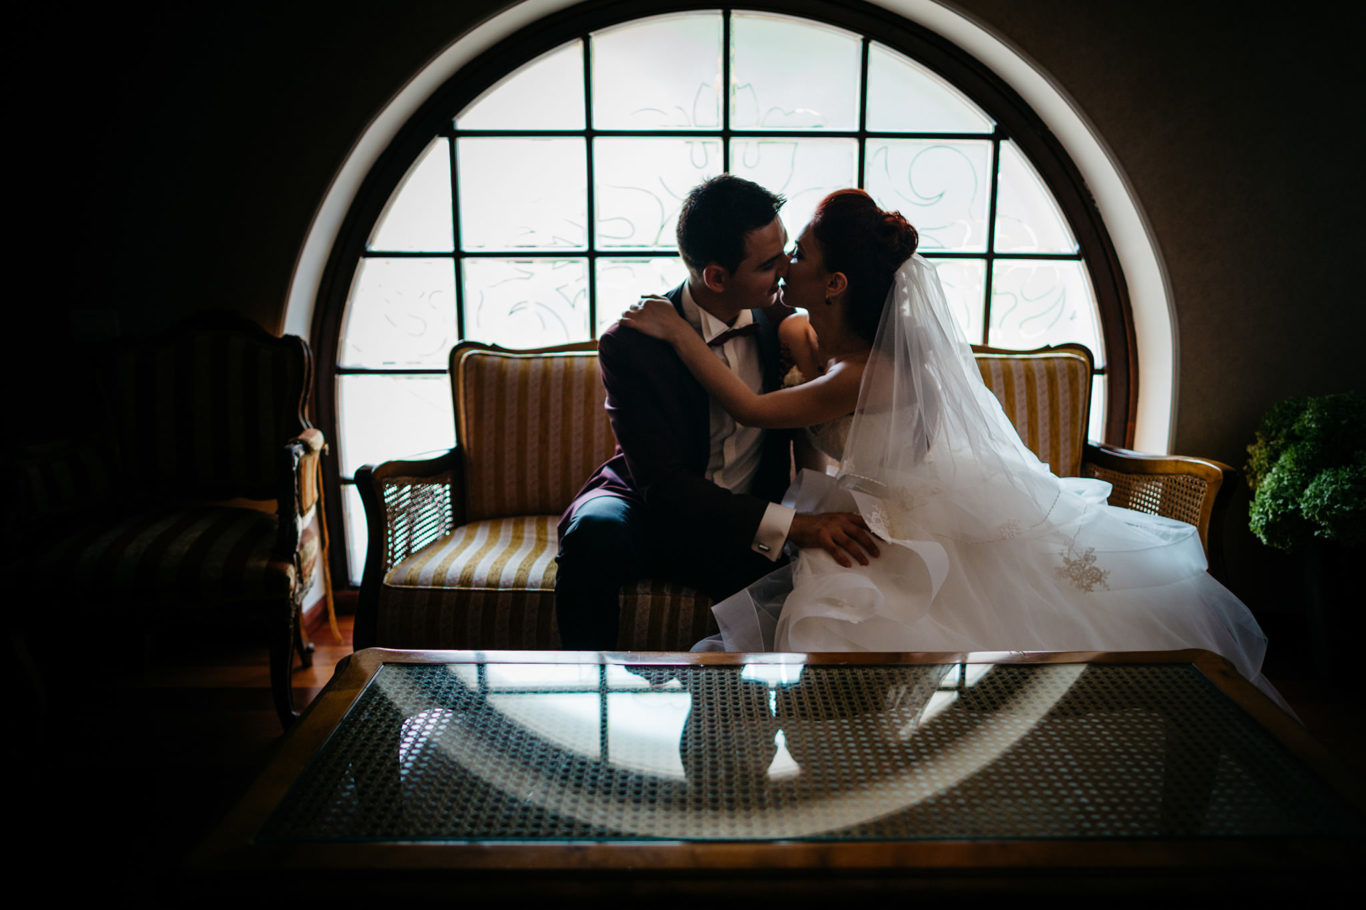 0224-fotografie-nunta-bucuresti-cristina-nicusor-fotograf-ciprian-dumitrescu-dc1_0100